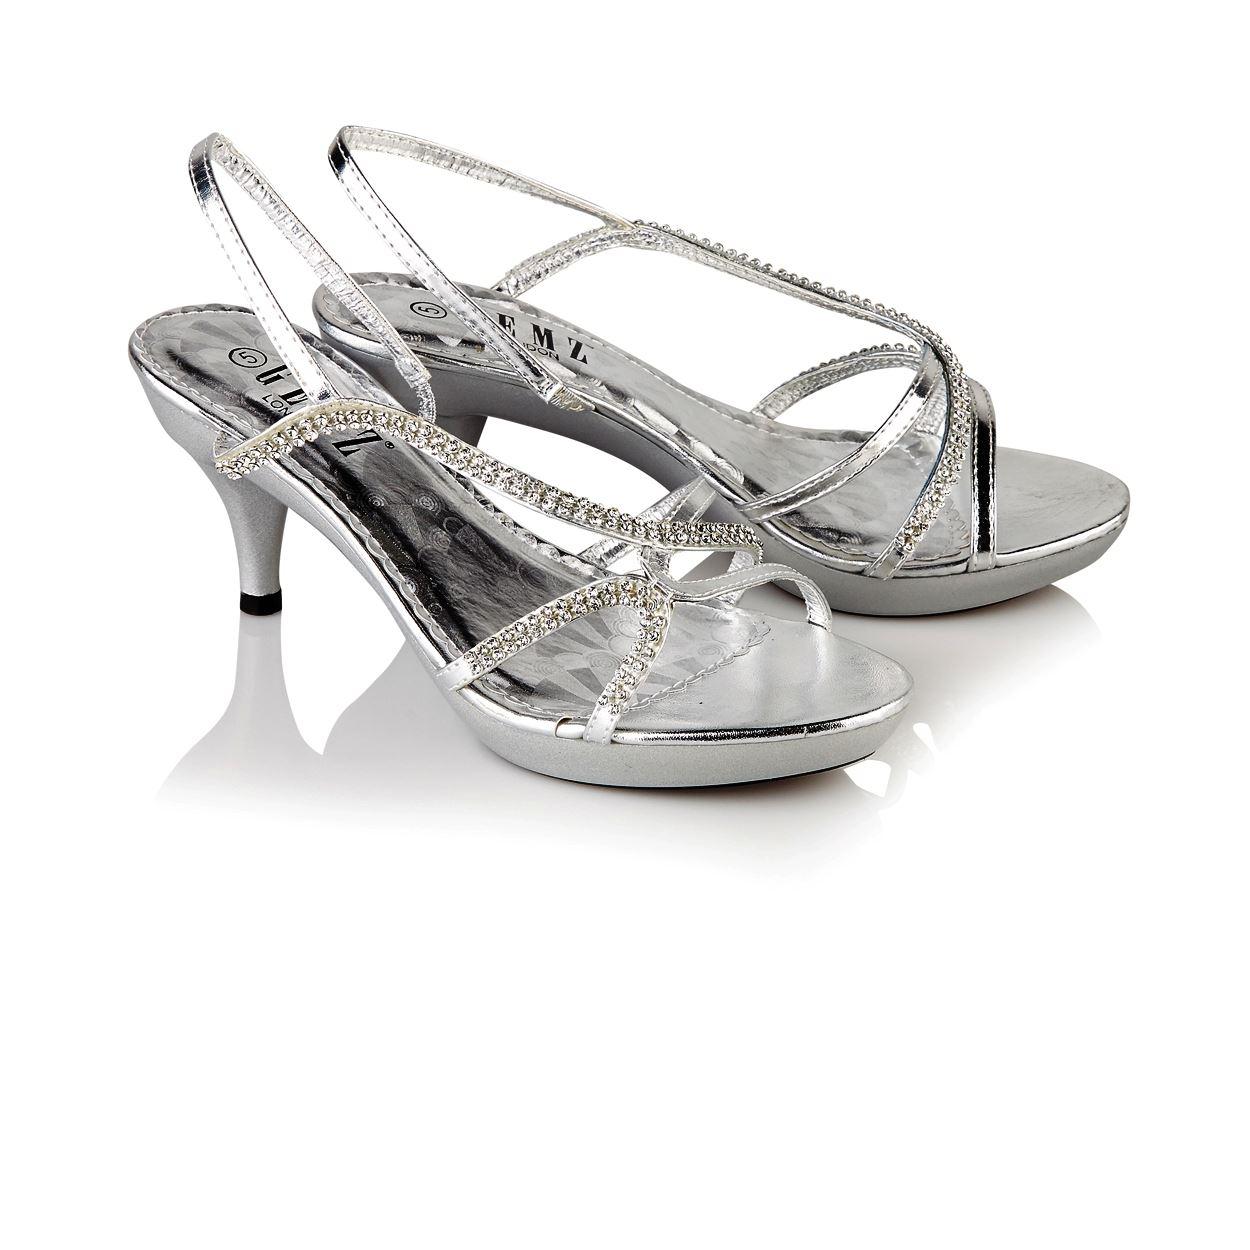 womens wedding evening prom shoes mid heel